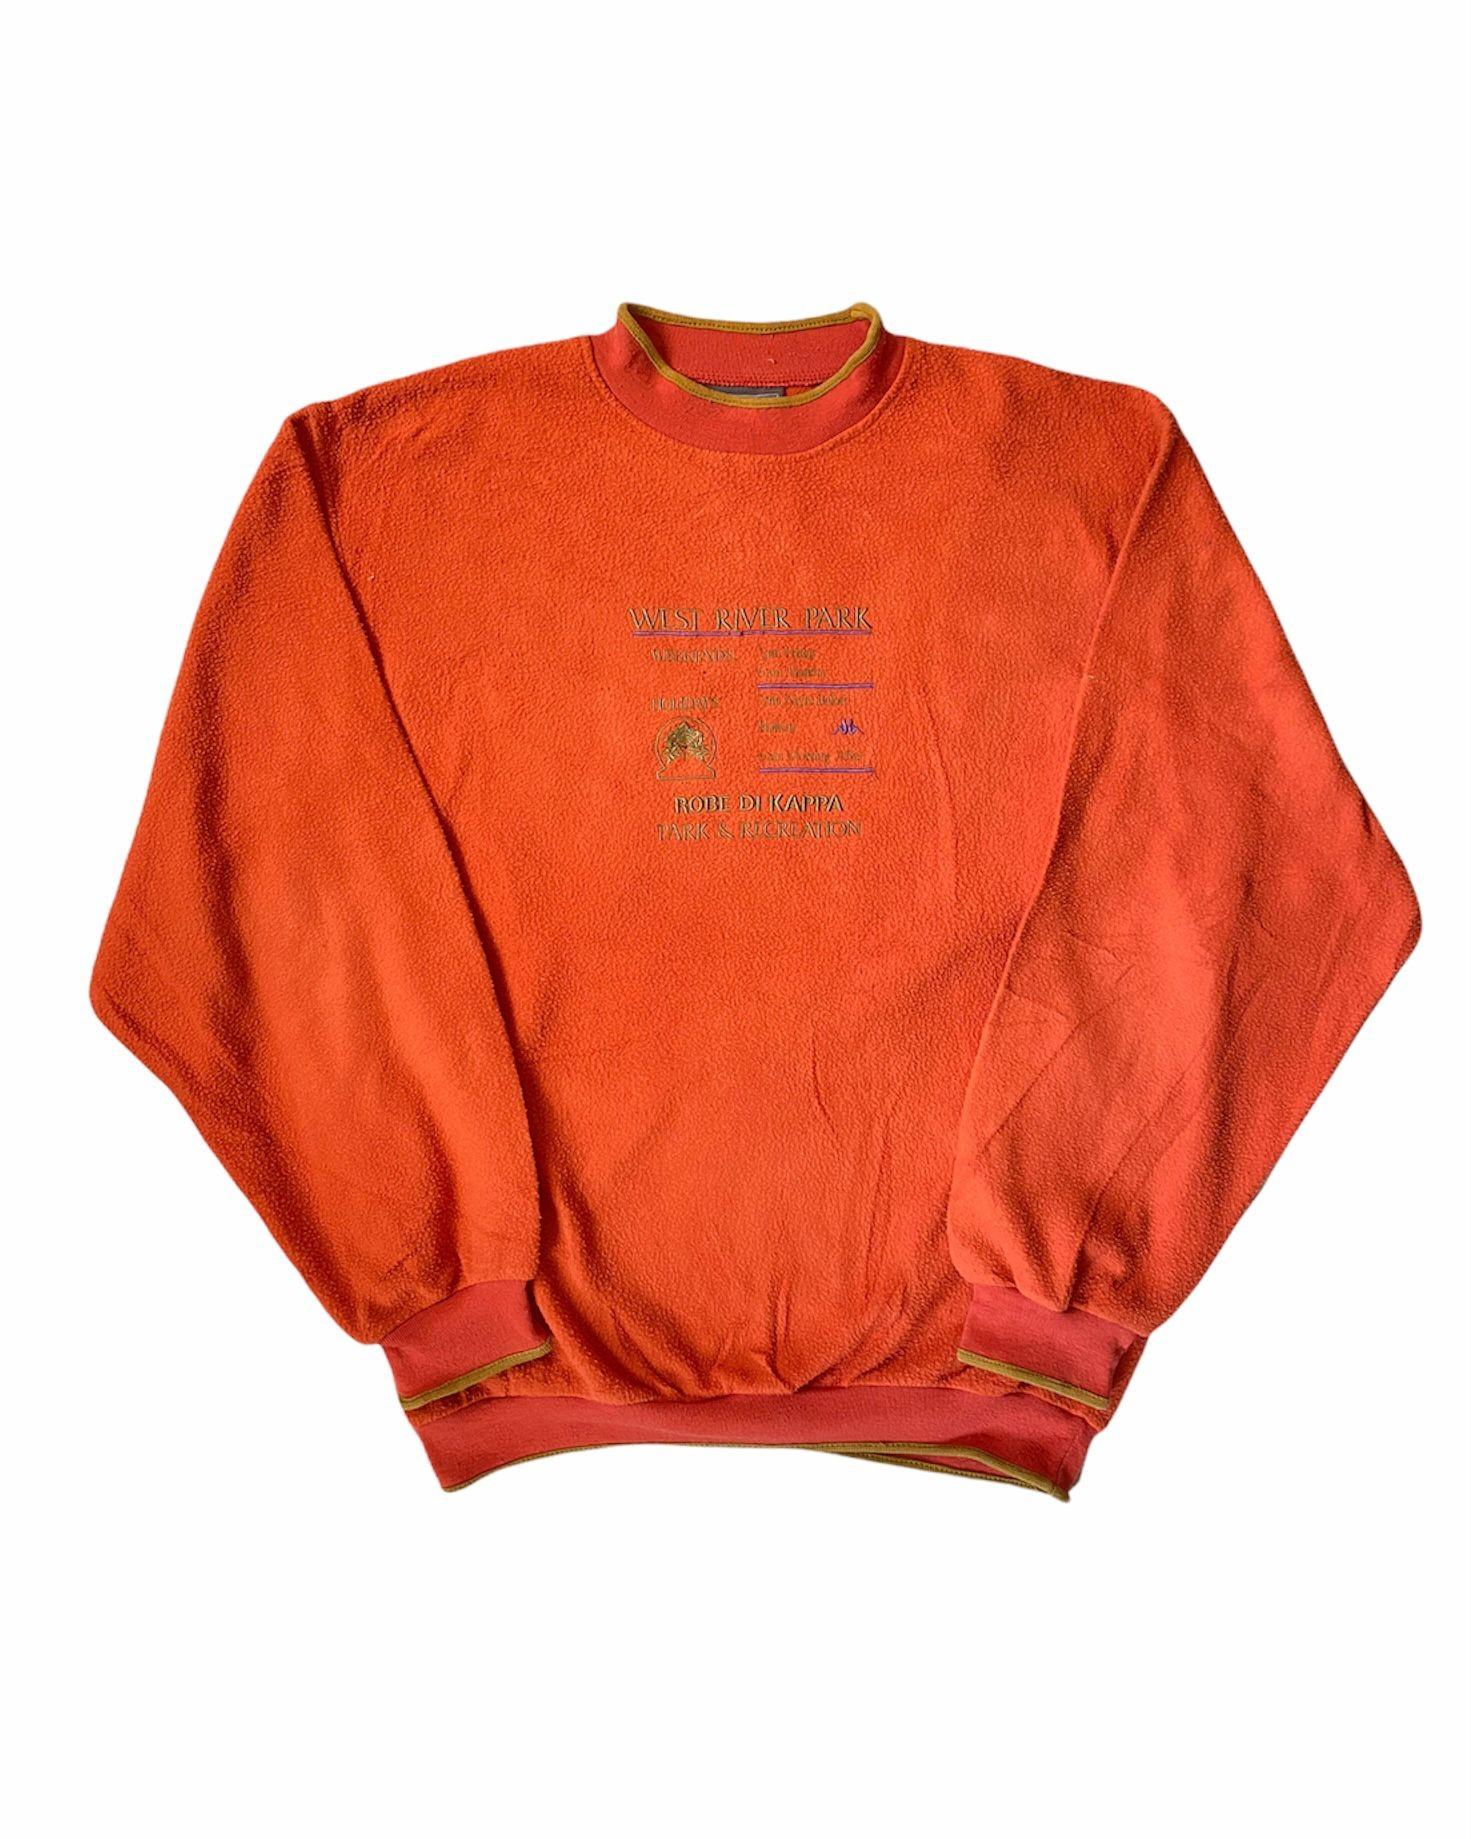 Kappa 90's Vintage Fleece Sweatshirt (L)